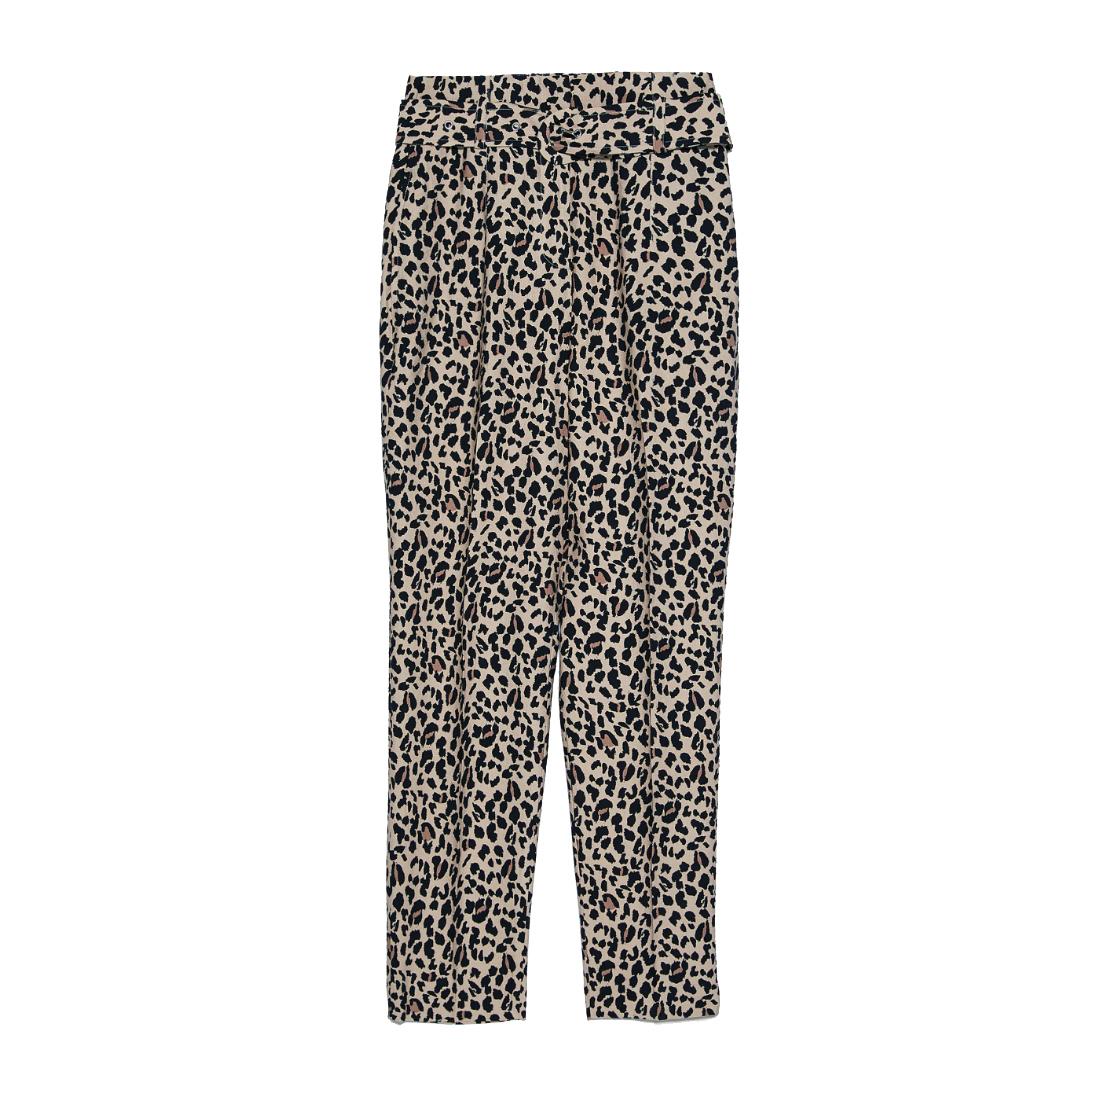 Pantalones de Zara.